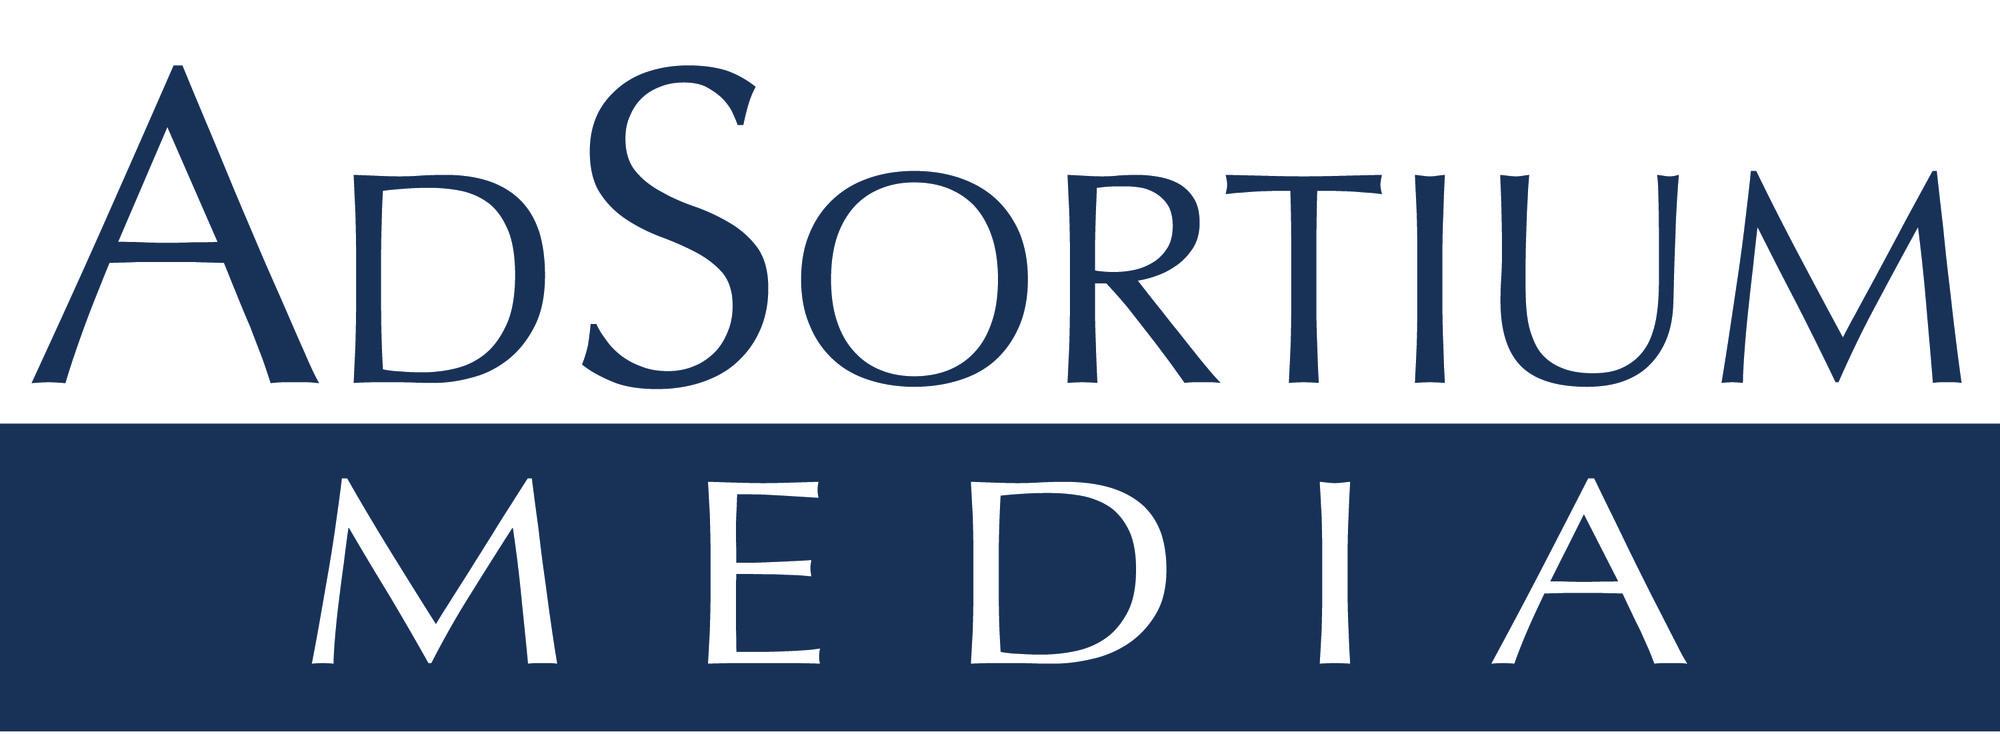 AdSortium Media thumbnail